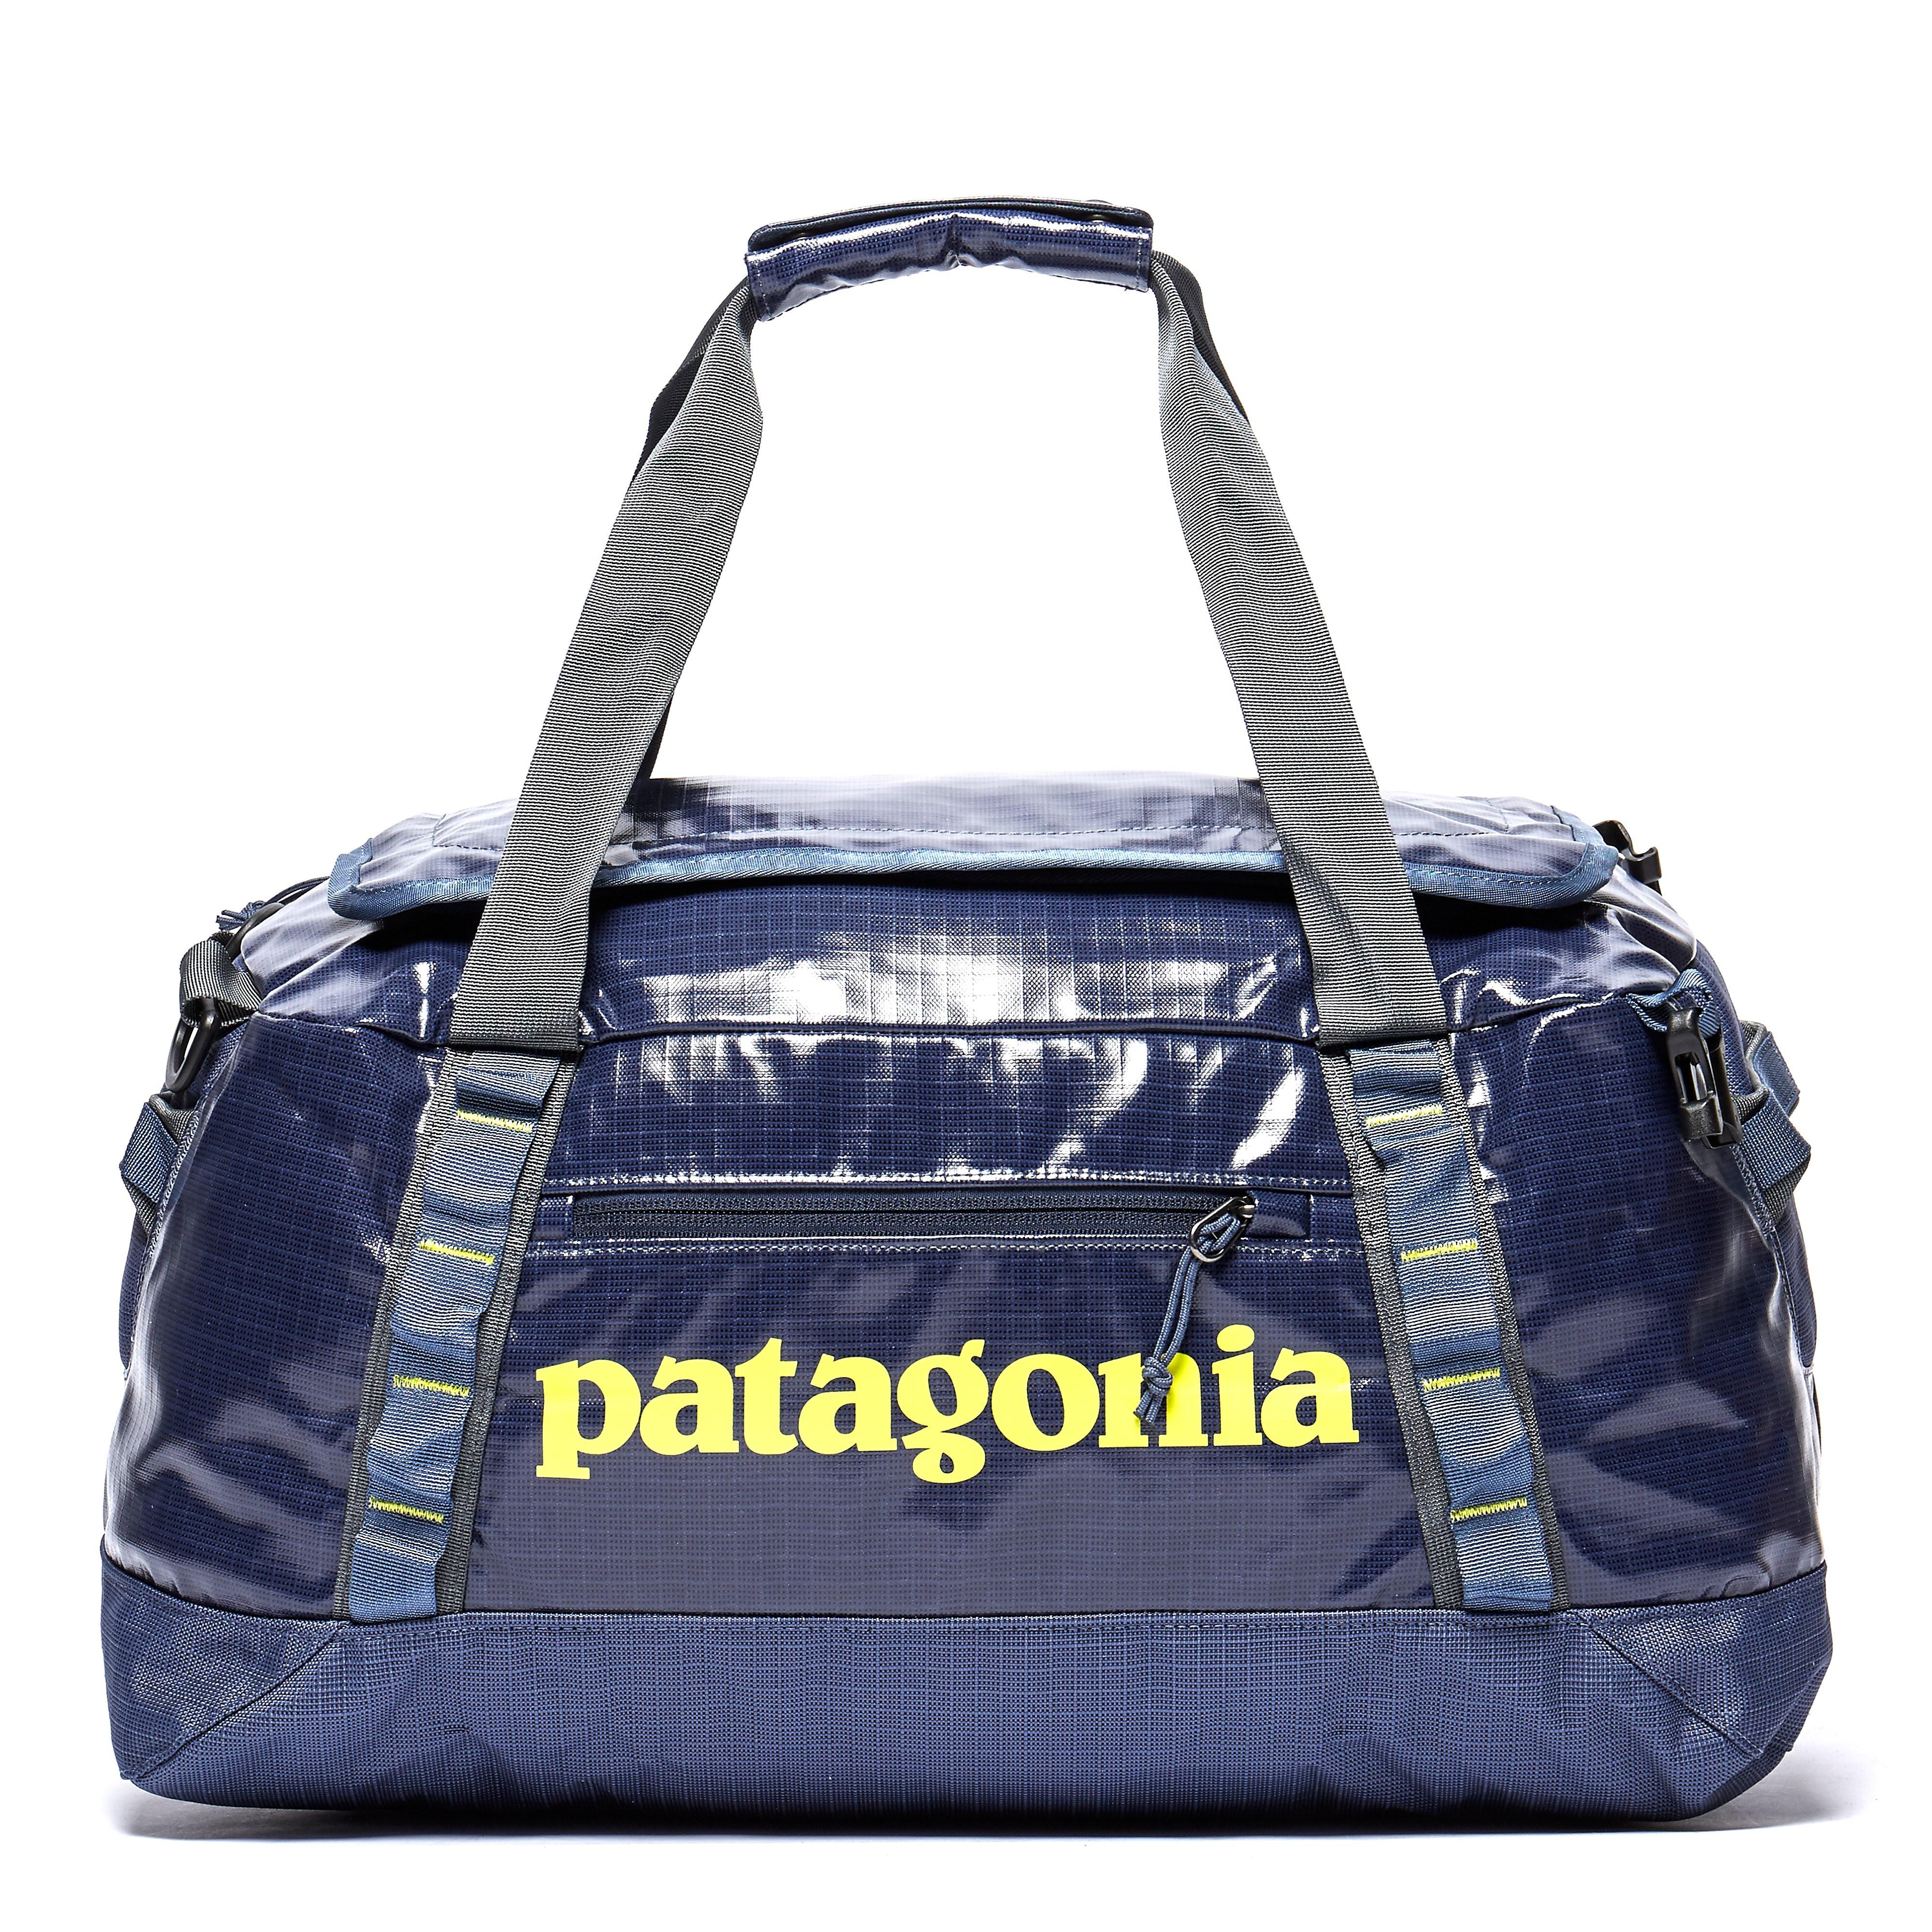 Patagonia Black Hole 45L Duffel Bag